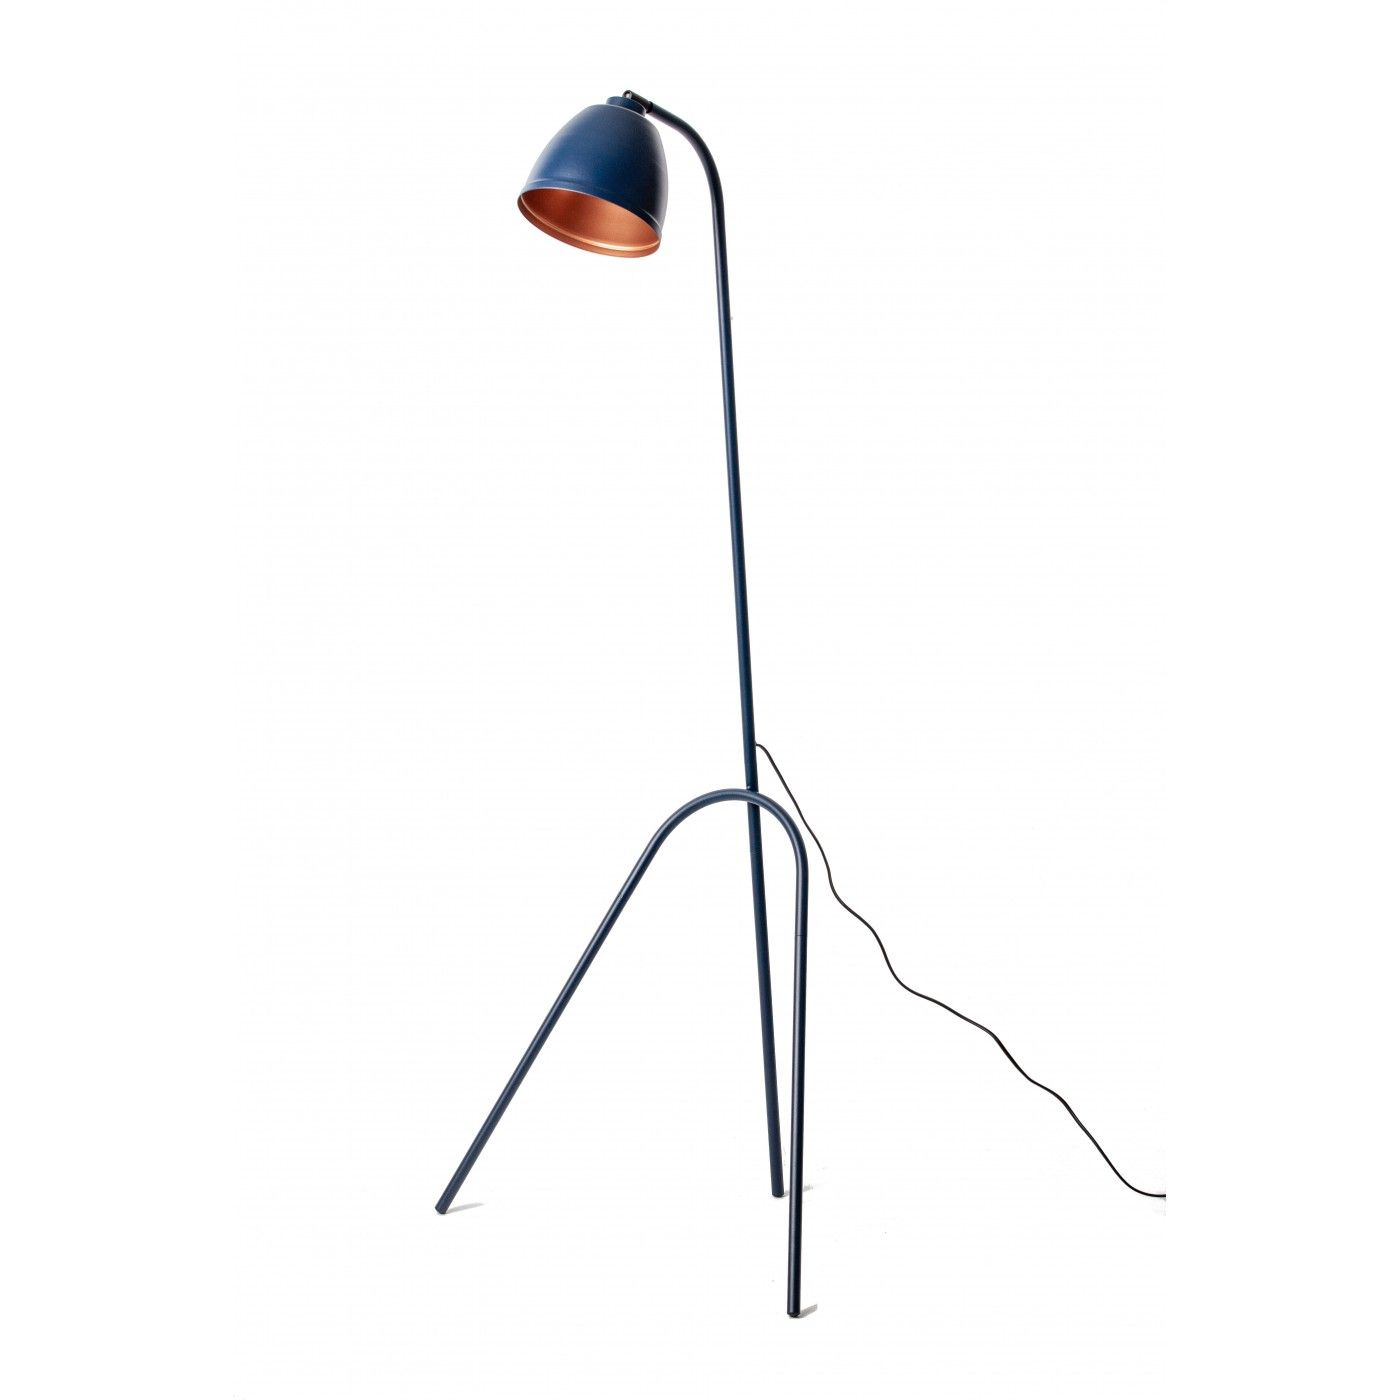 Loft Lampa Stojaca Podlogowa Genua Granatowa 148x35x16 Cm Tb373 Home Decor Decor Lamp